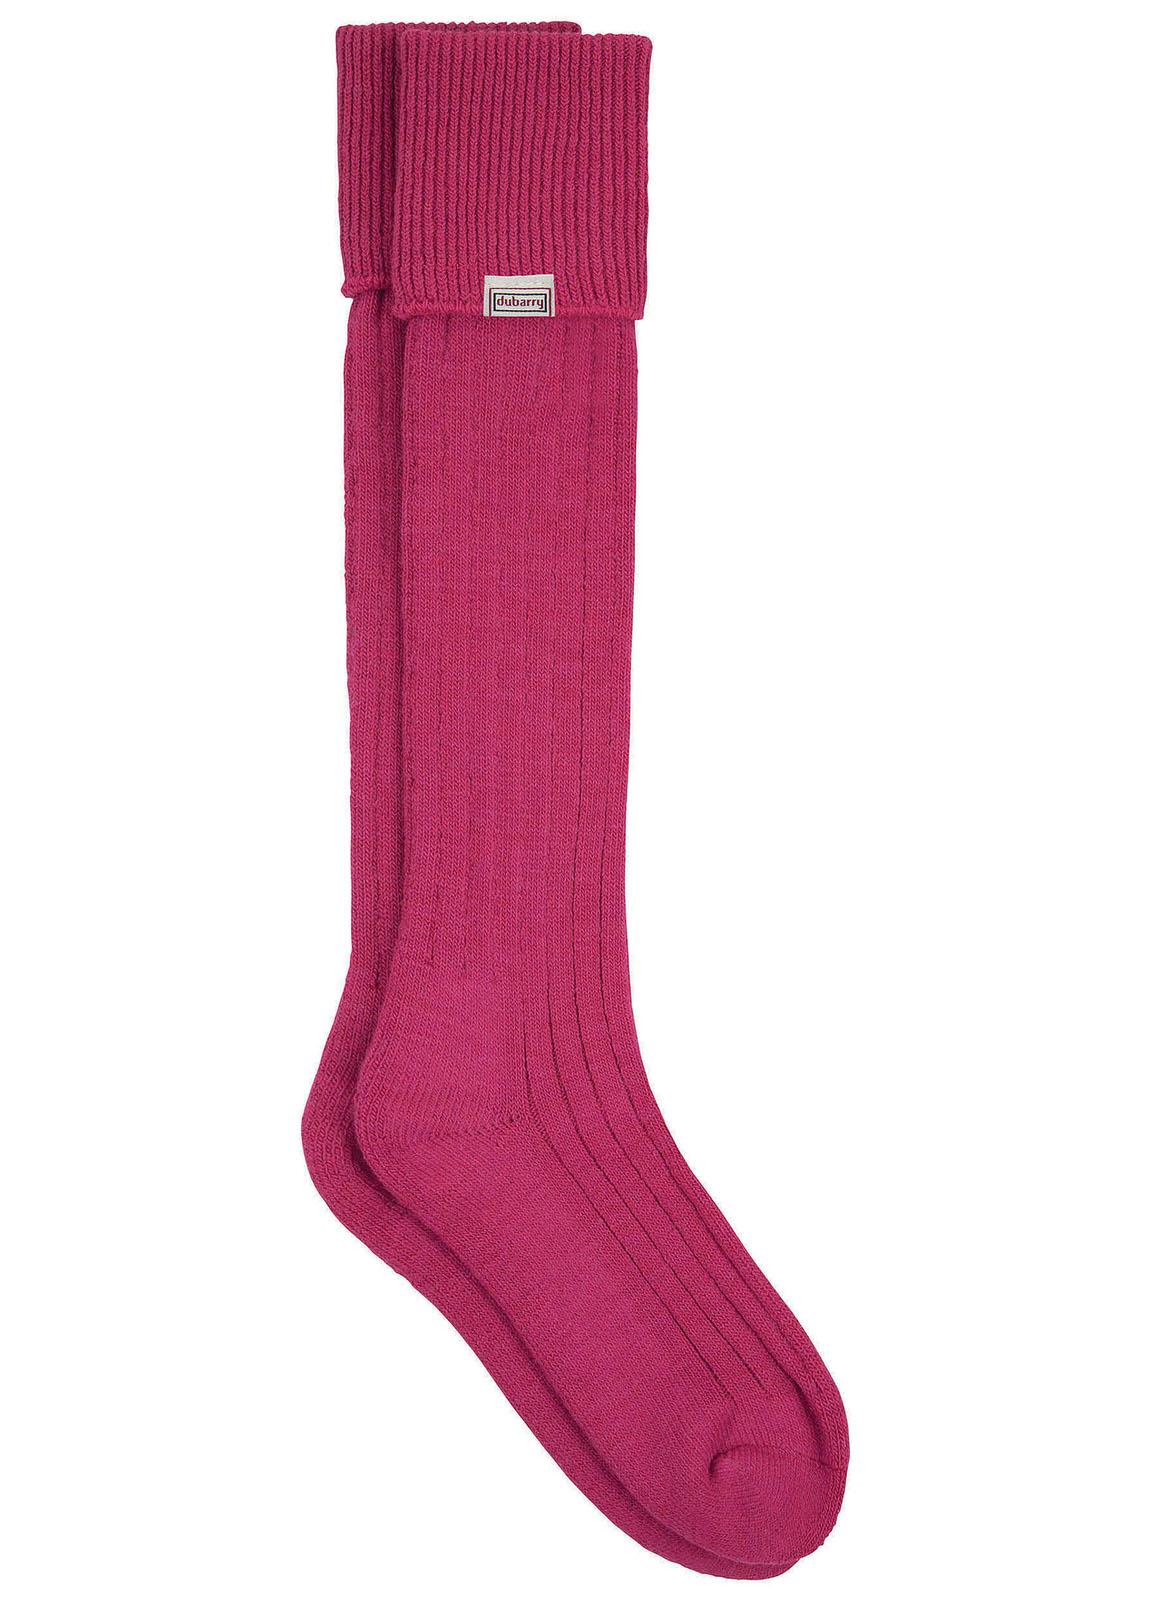 Alpaca_Socks_Pink_Image_1